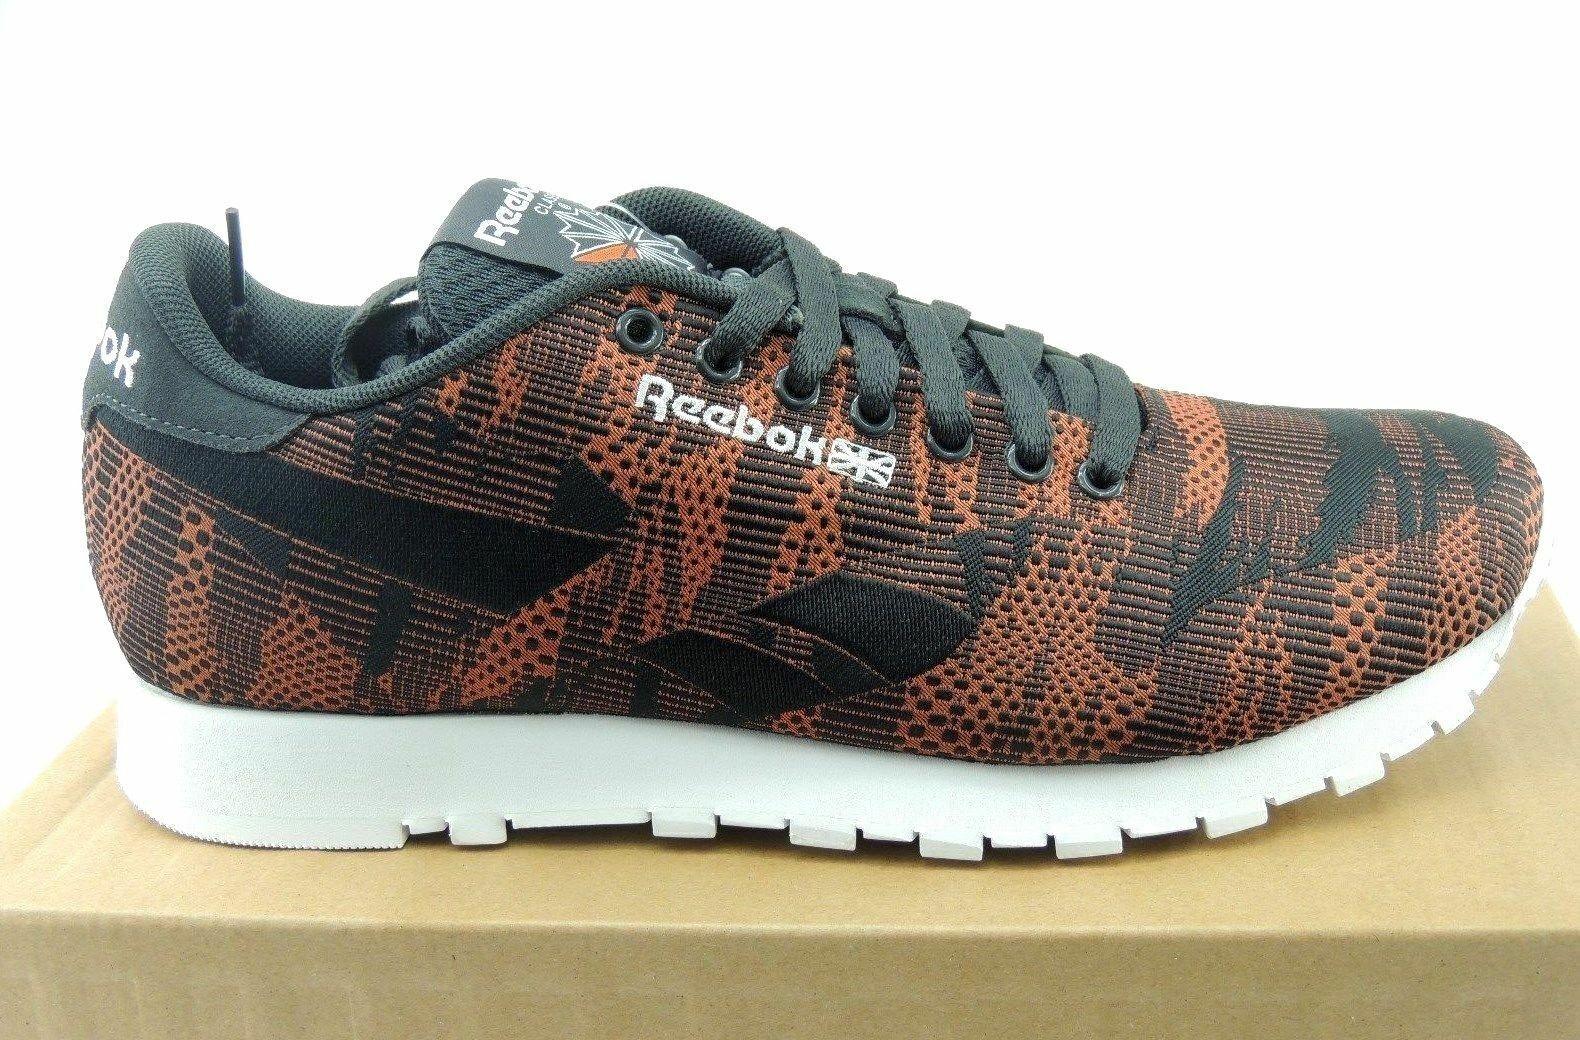 Reebok Classic Runner Herren Sneaker Sport Running Fitness Freizeit Schuhe